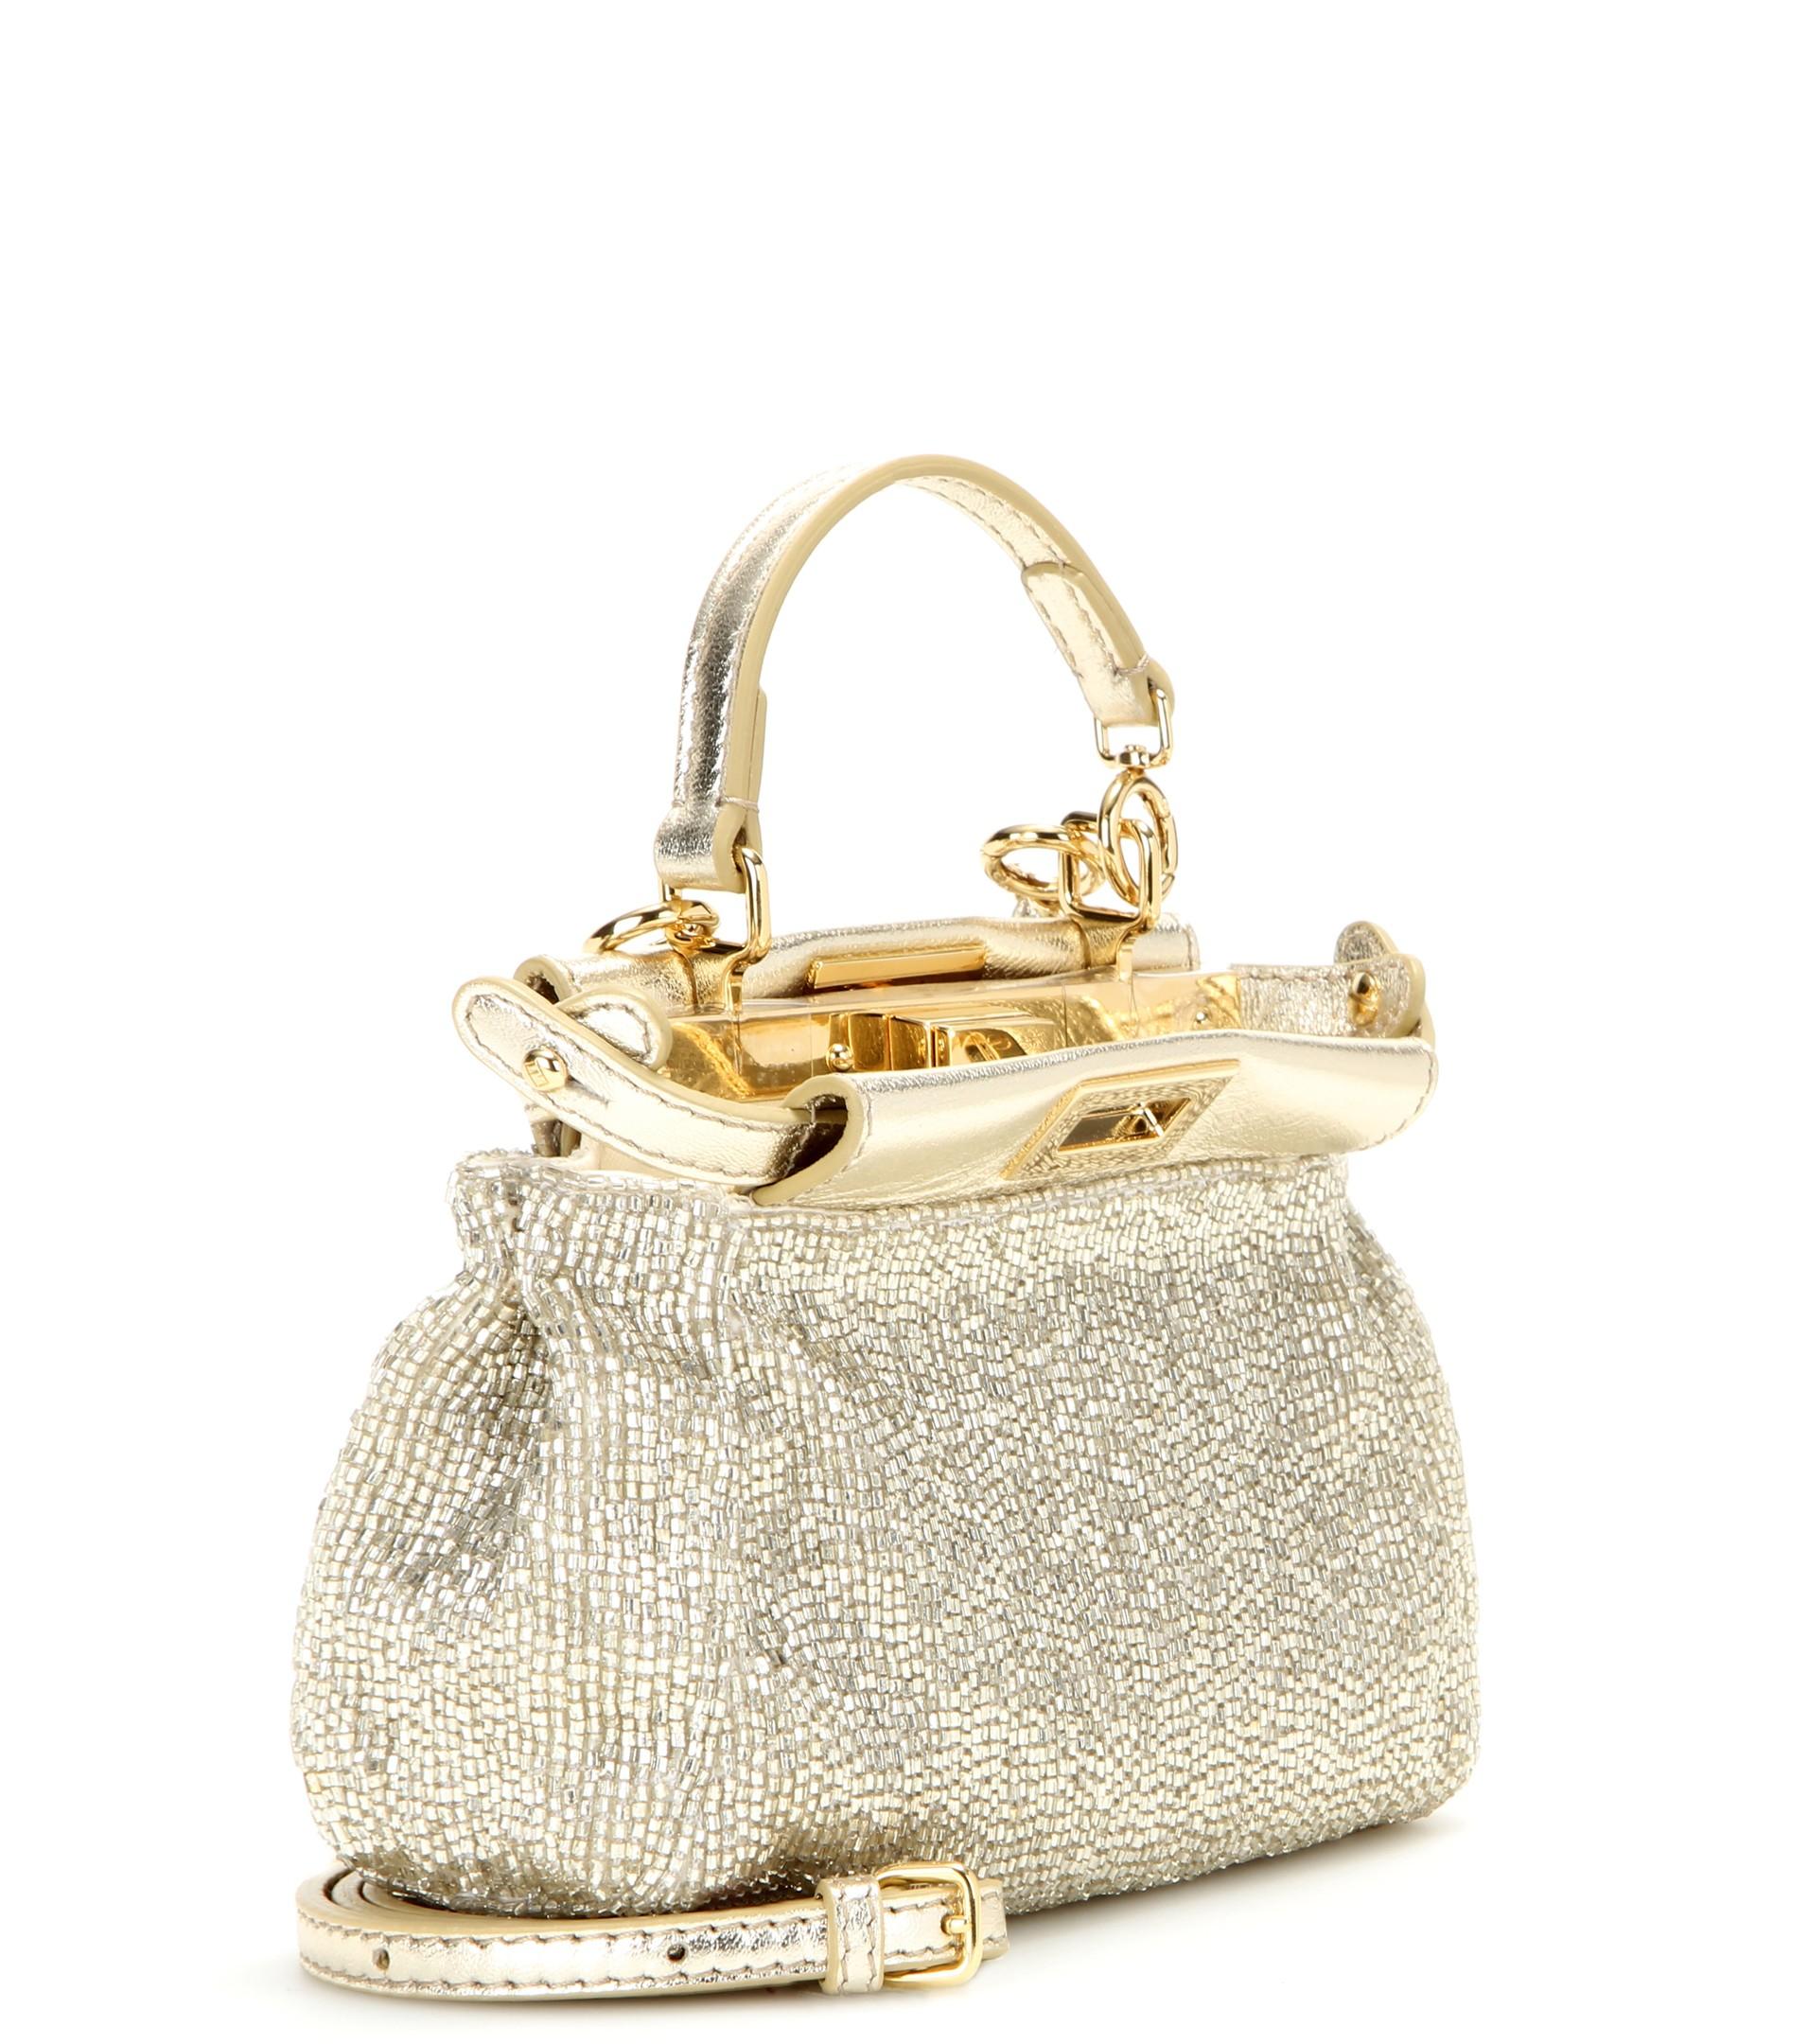 518d30c7b50 Fendi Metallic Pouch Micro Embellished Shoulder Bag